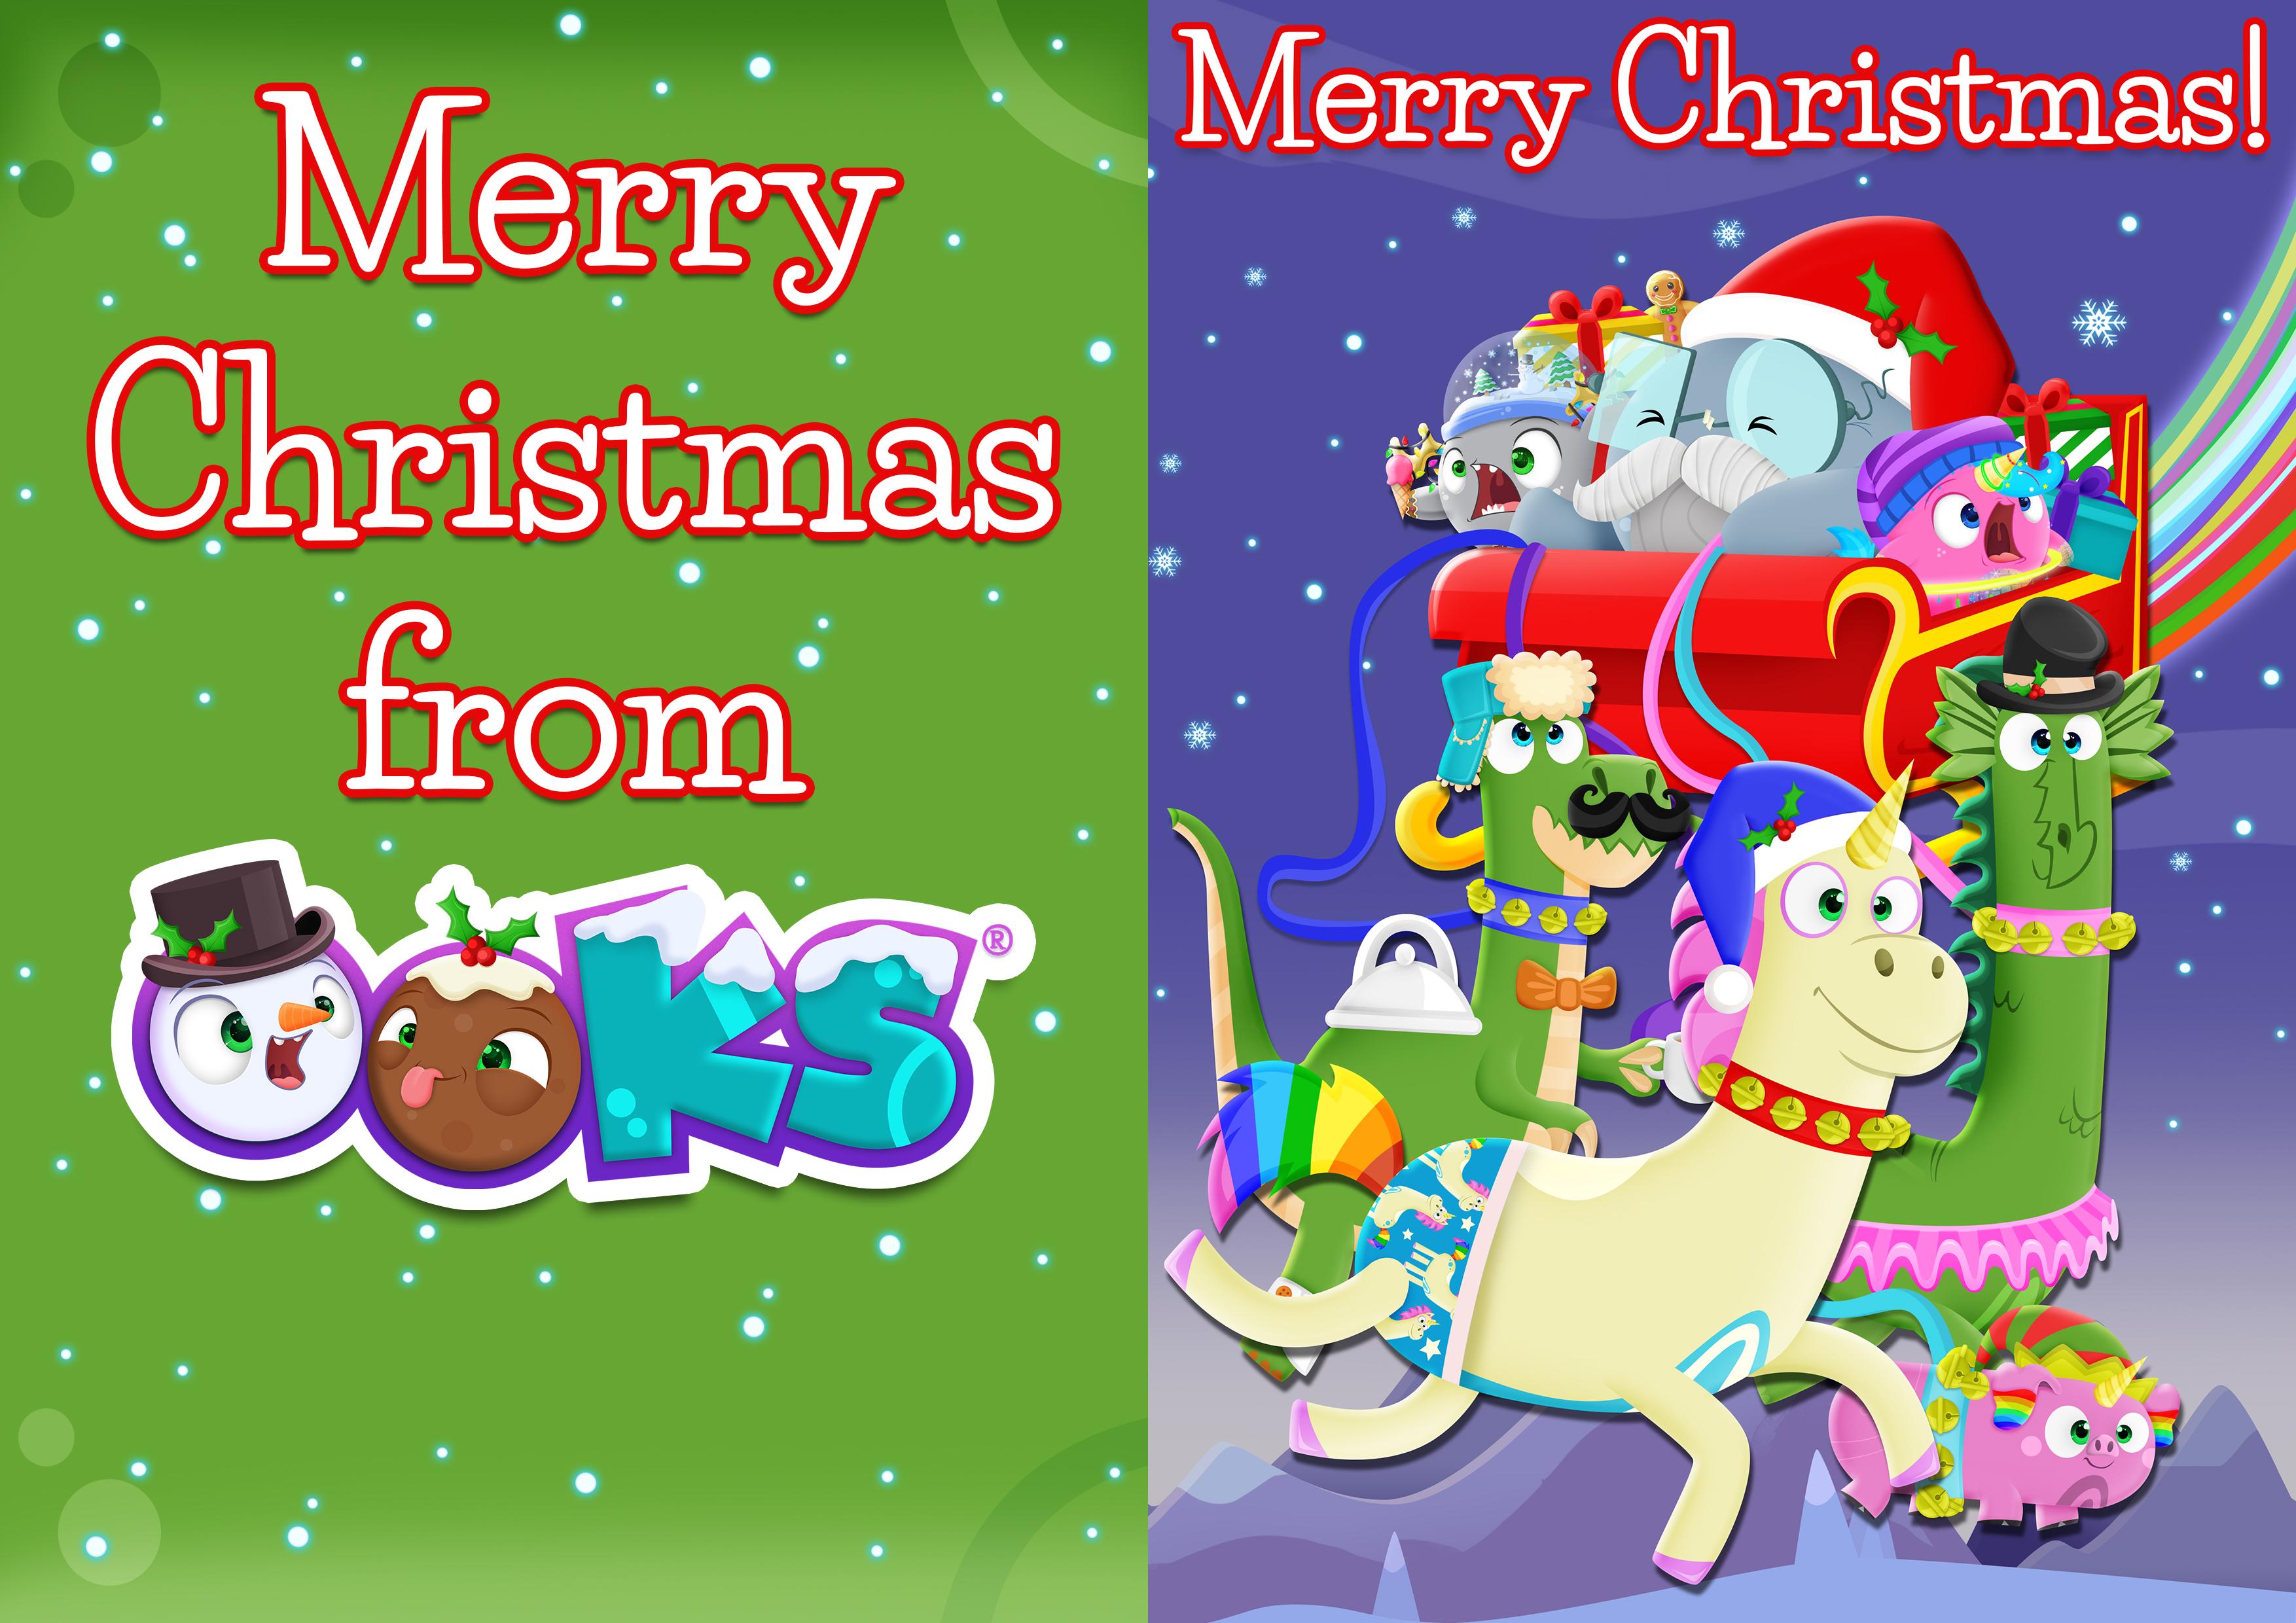 OOKS_Christmas_Card